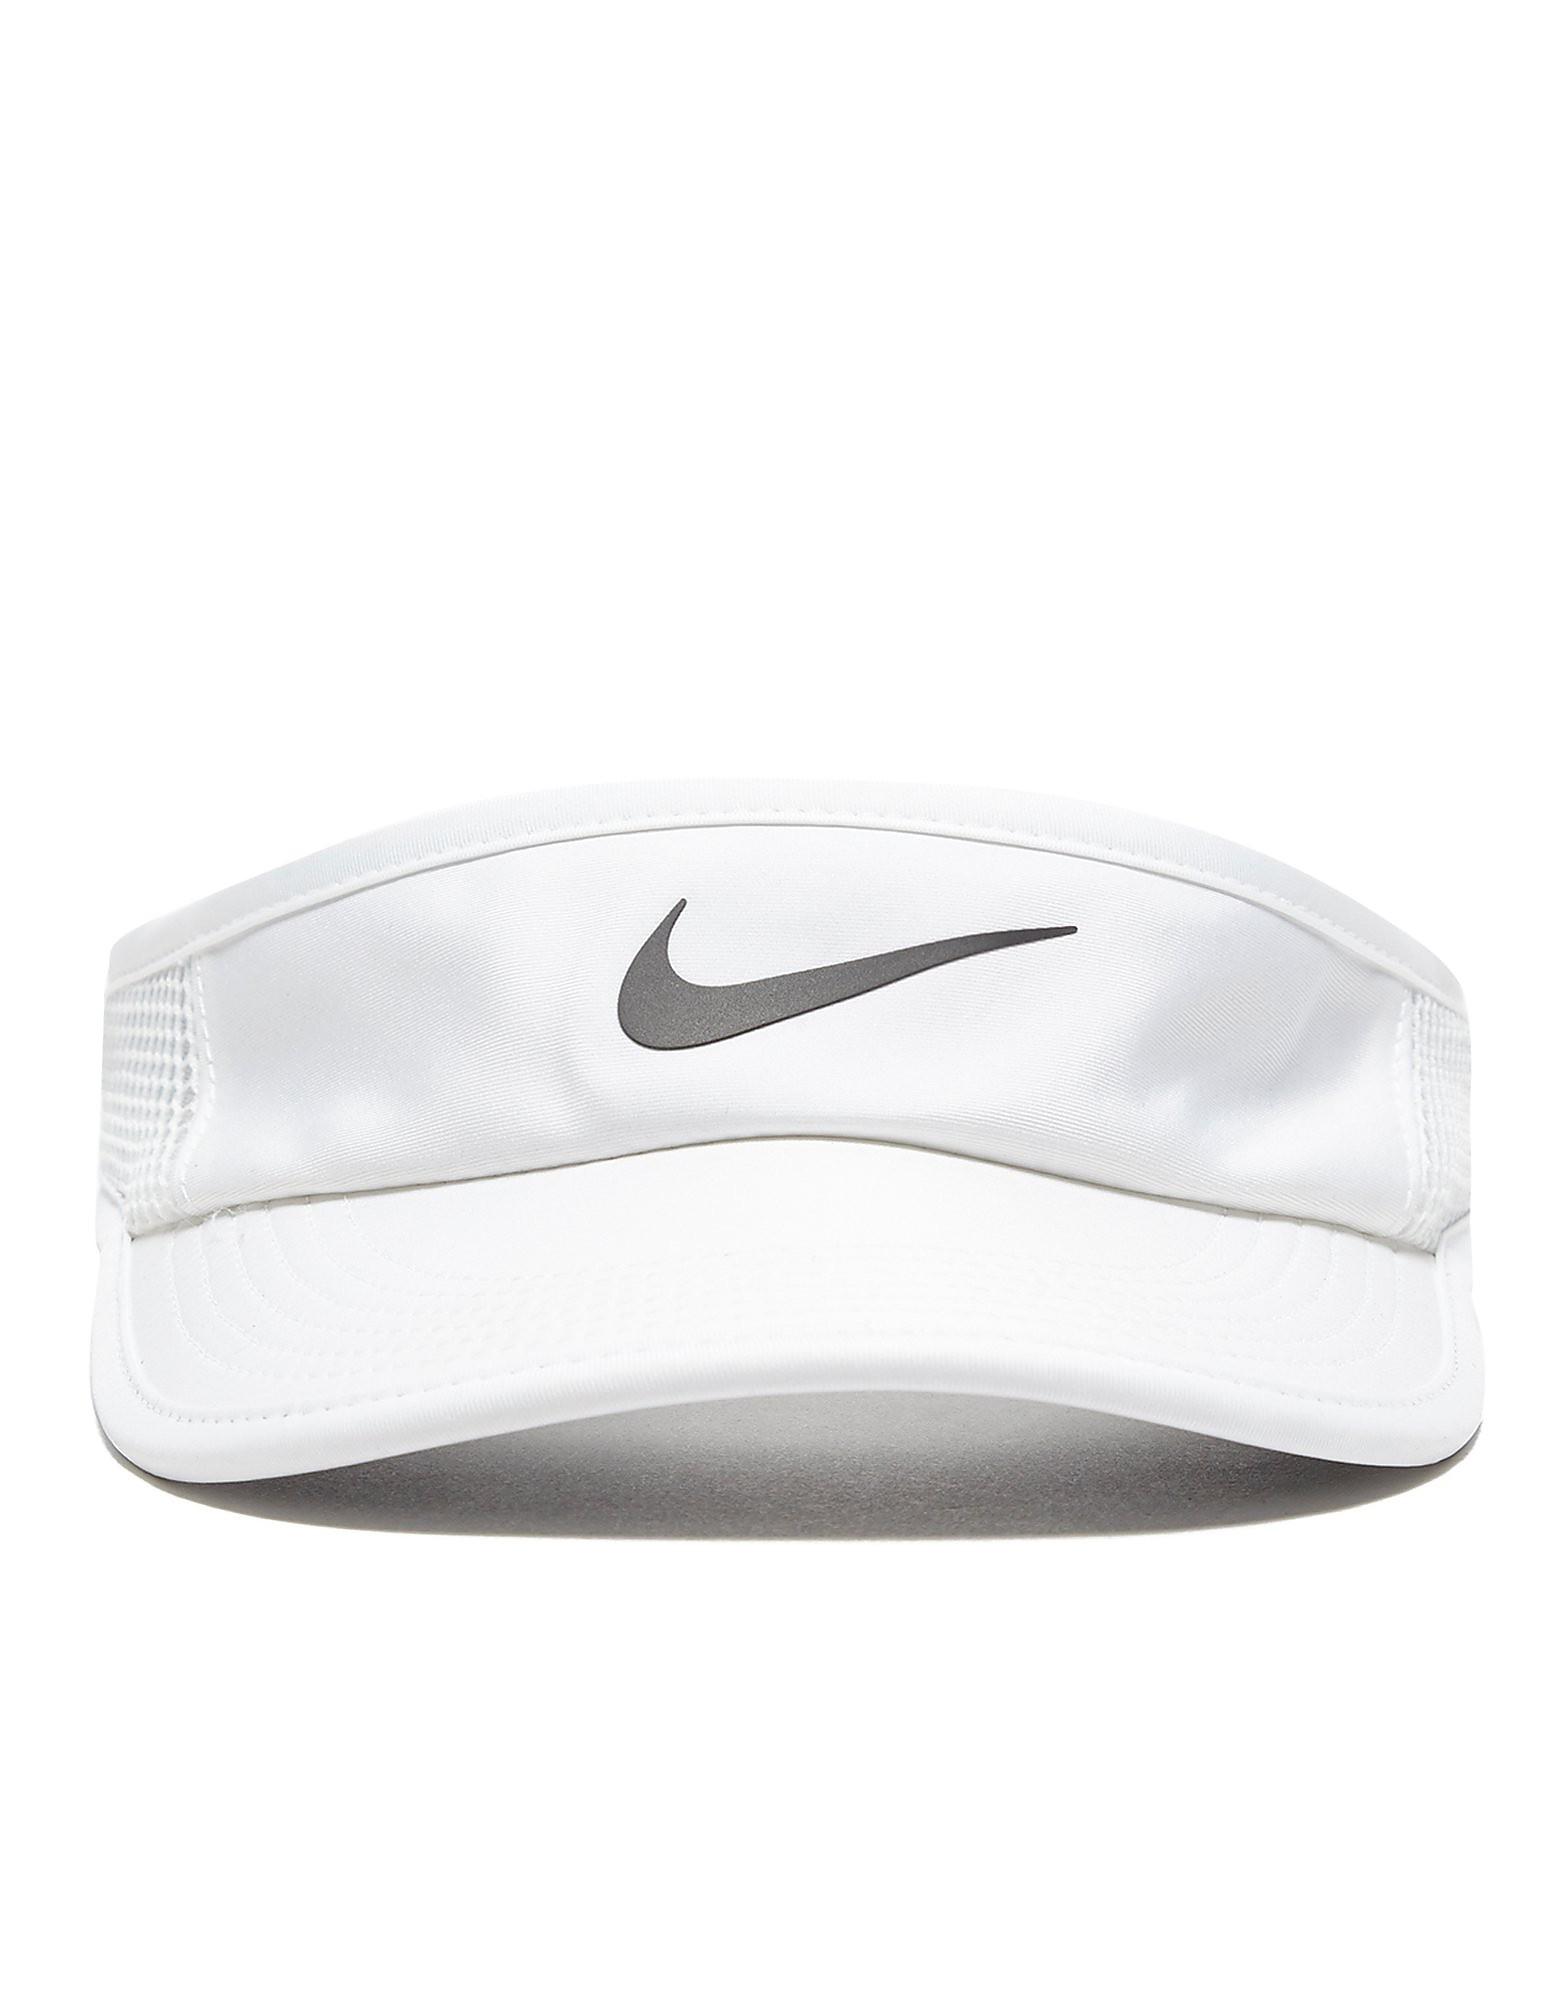 Nike Aerobill Tennis Visor